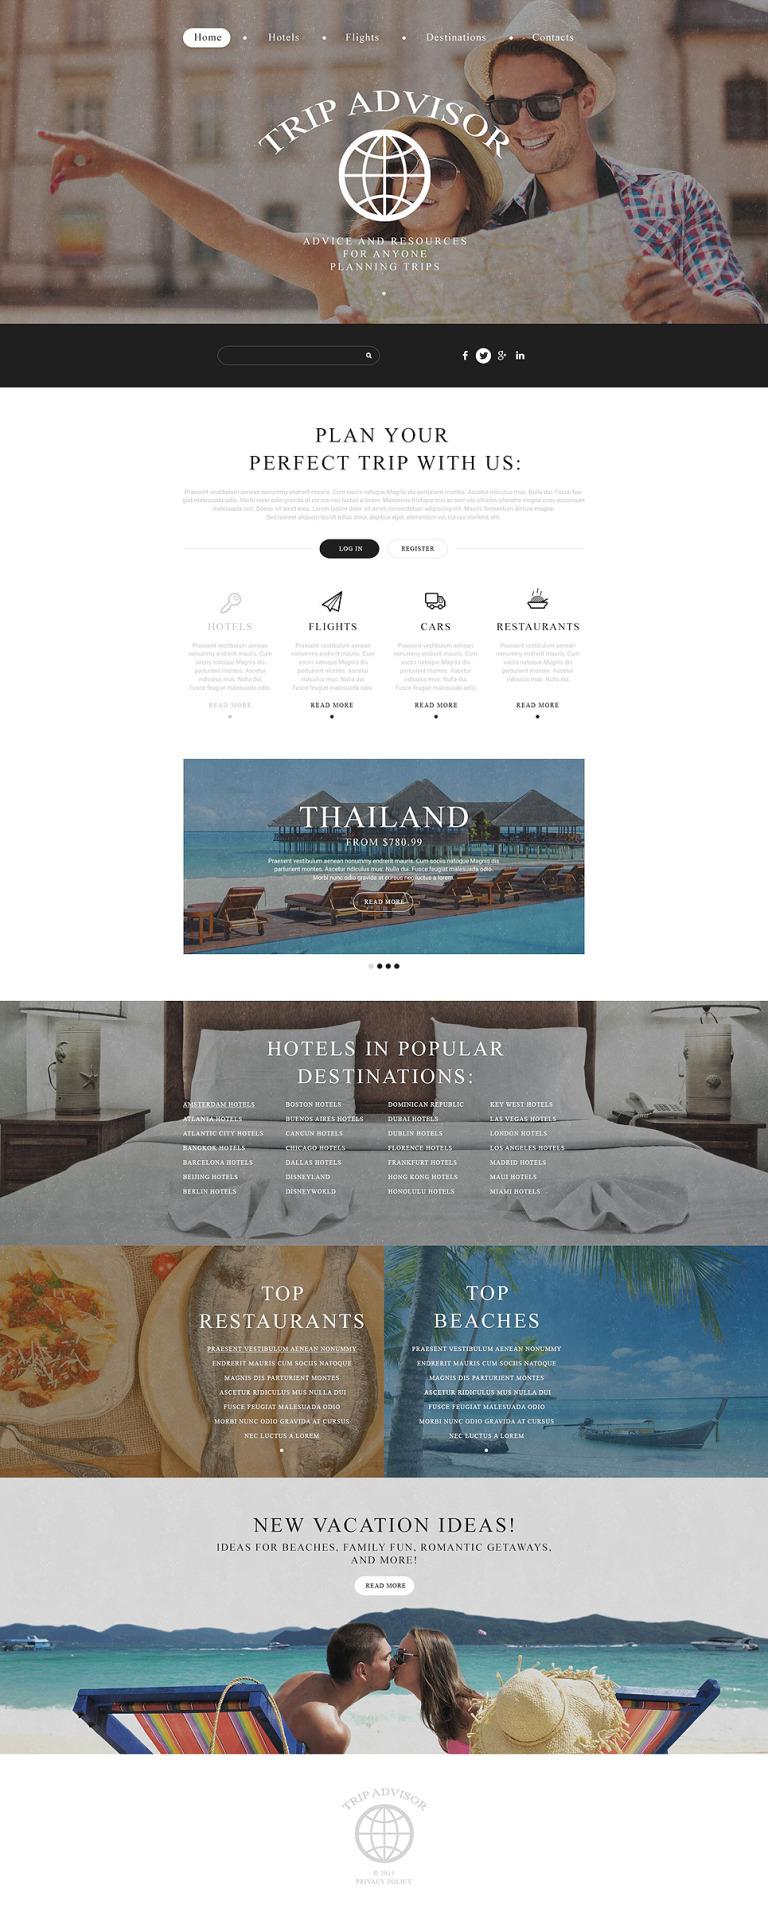 Trip Advisor Website Template New Screenshots BIG